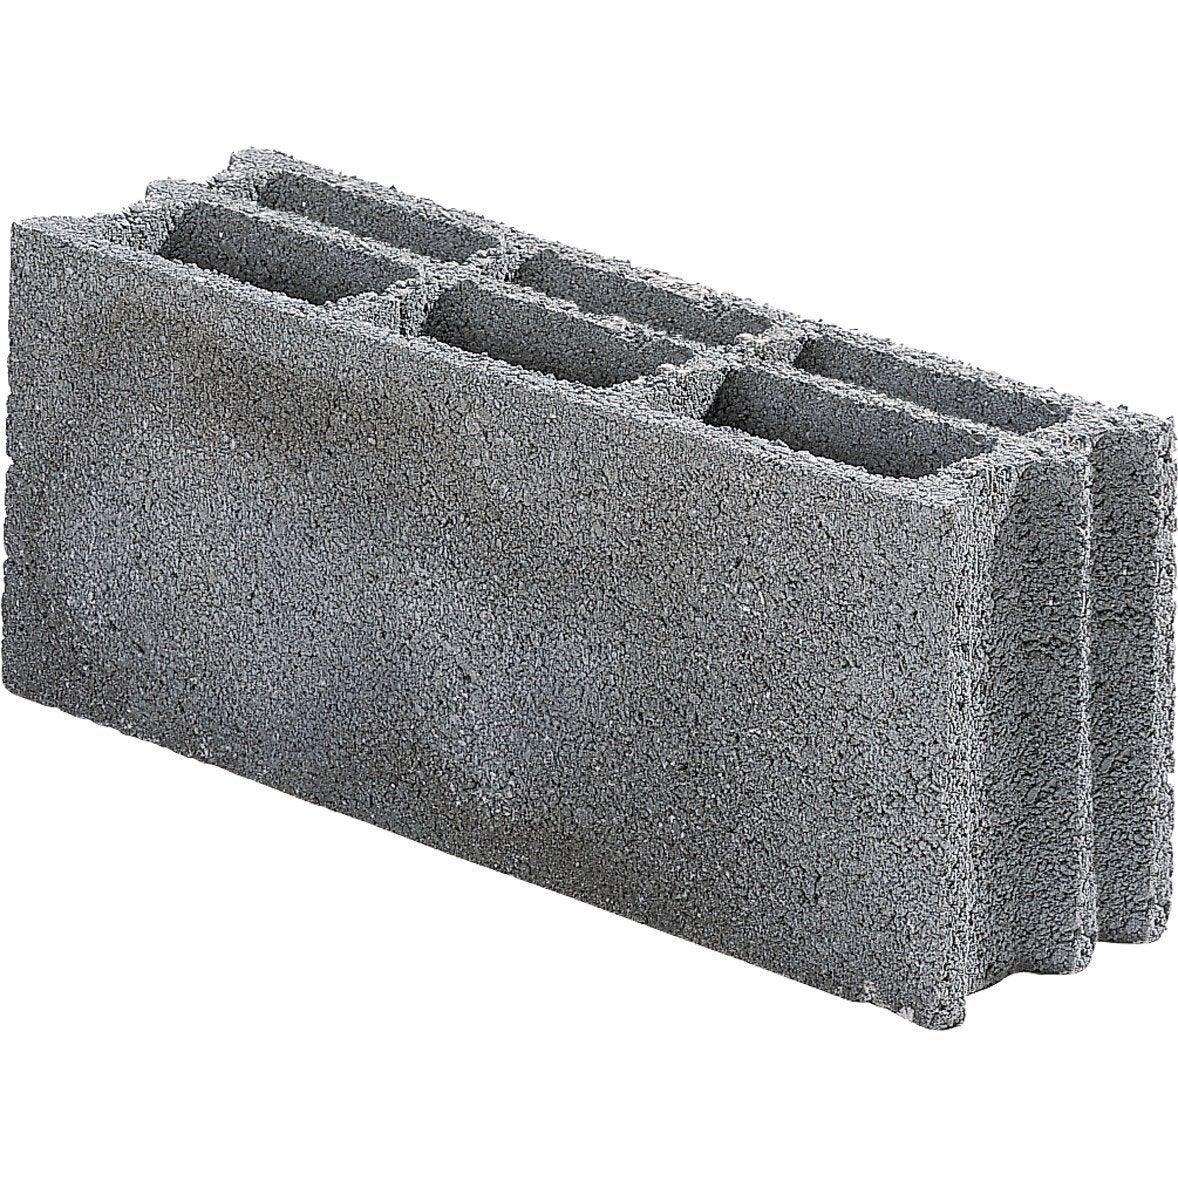 parpaing bancher 15x20x50 cm leroy merlin. Black Bedroom Furniture Sets. Home Design Ideas